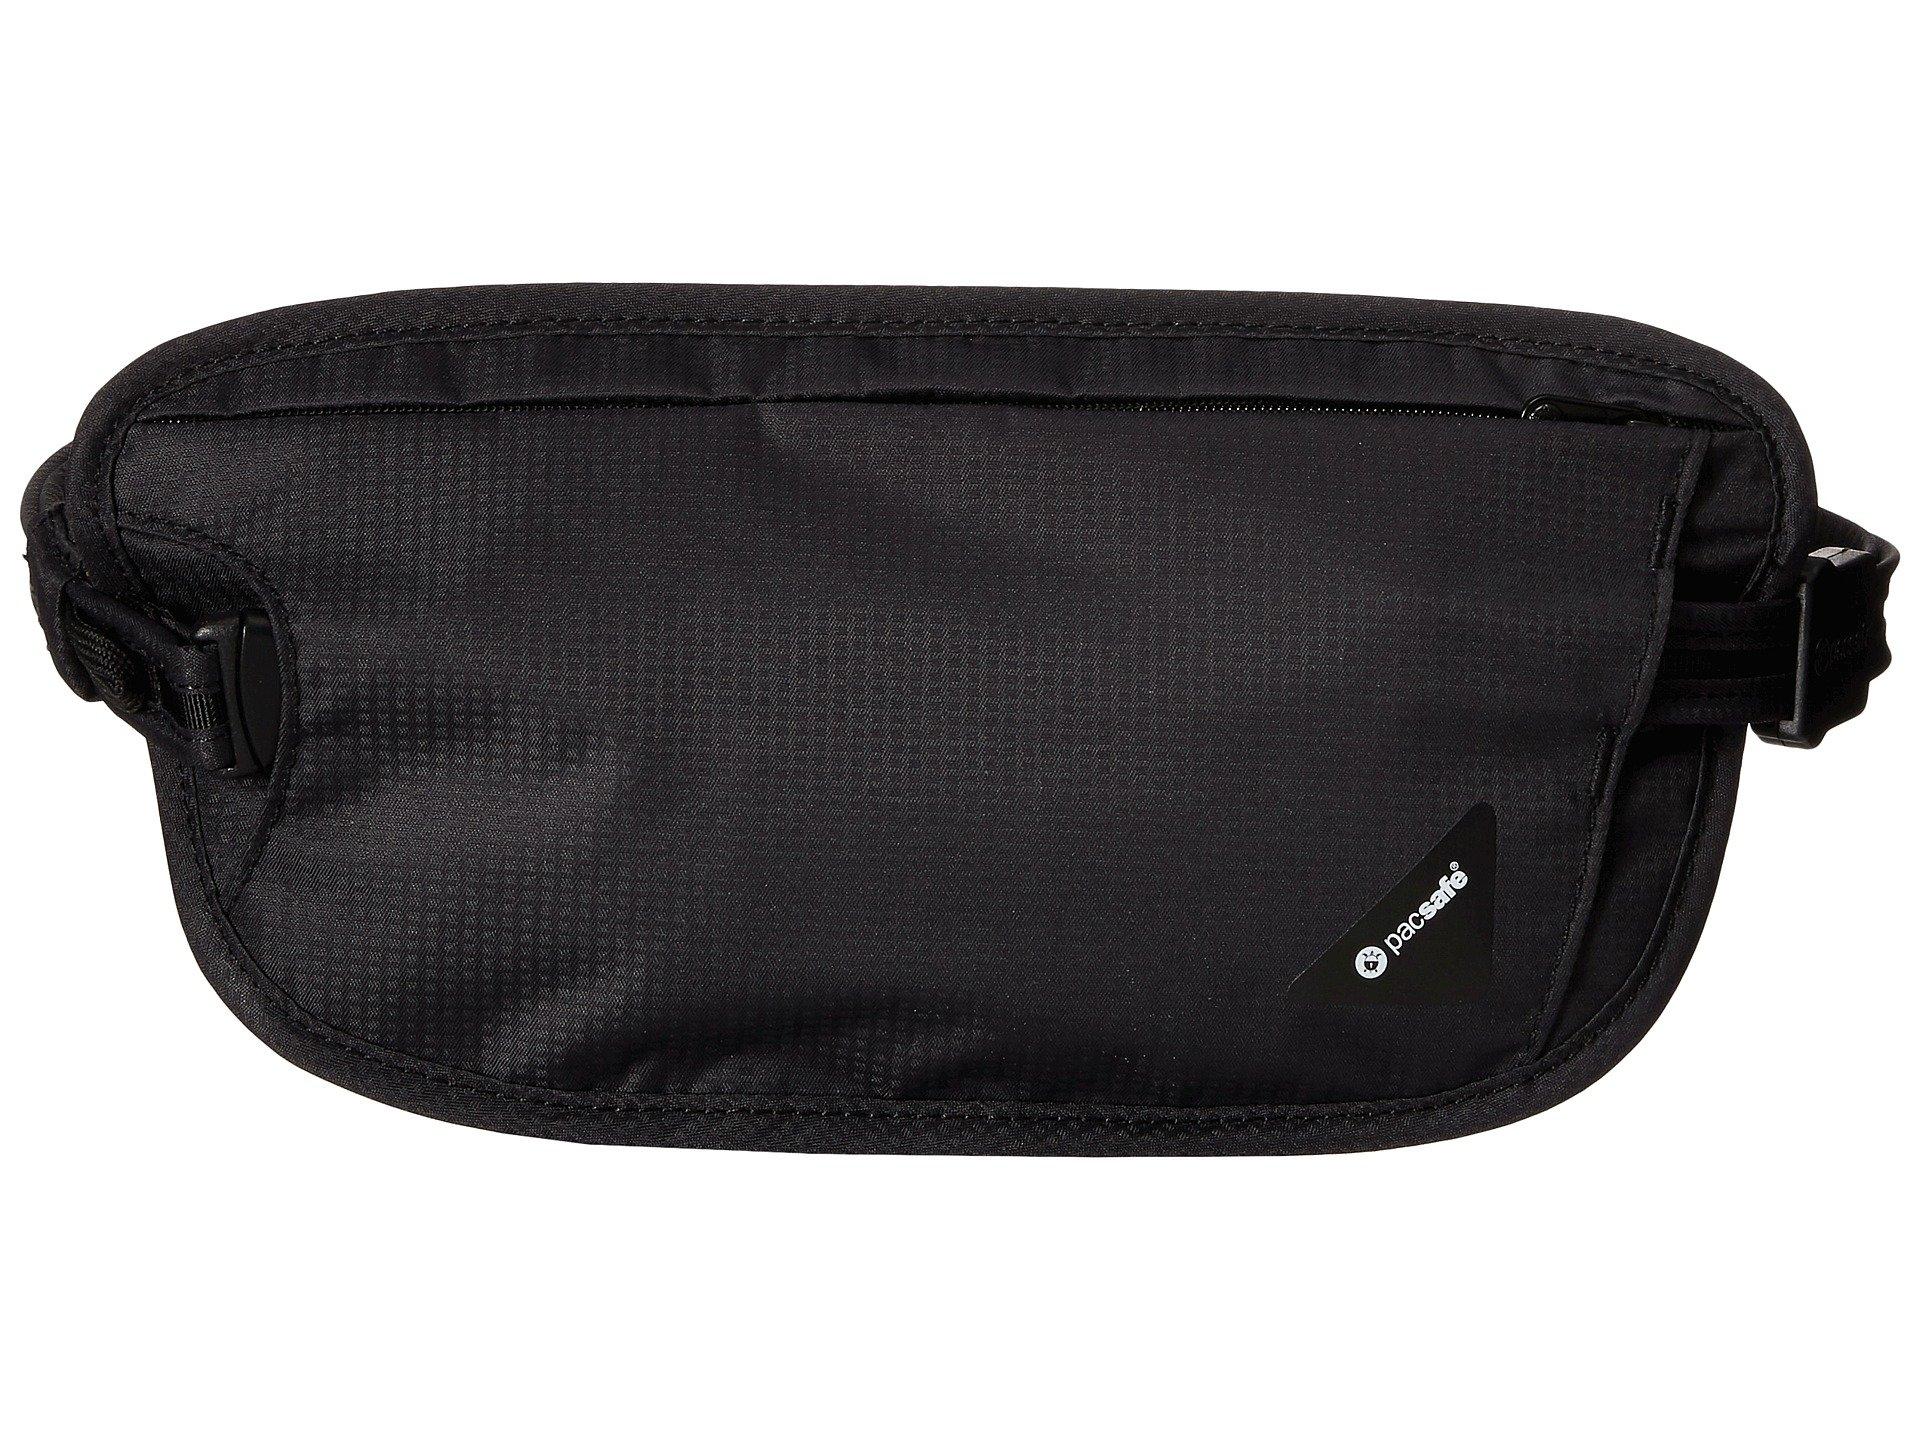 Pacsafe Waist Wallet Rfid Coversafe X100 Black 66vqBf